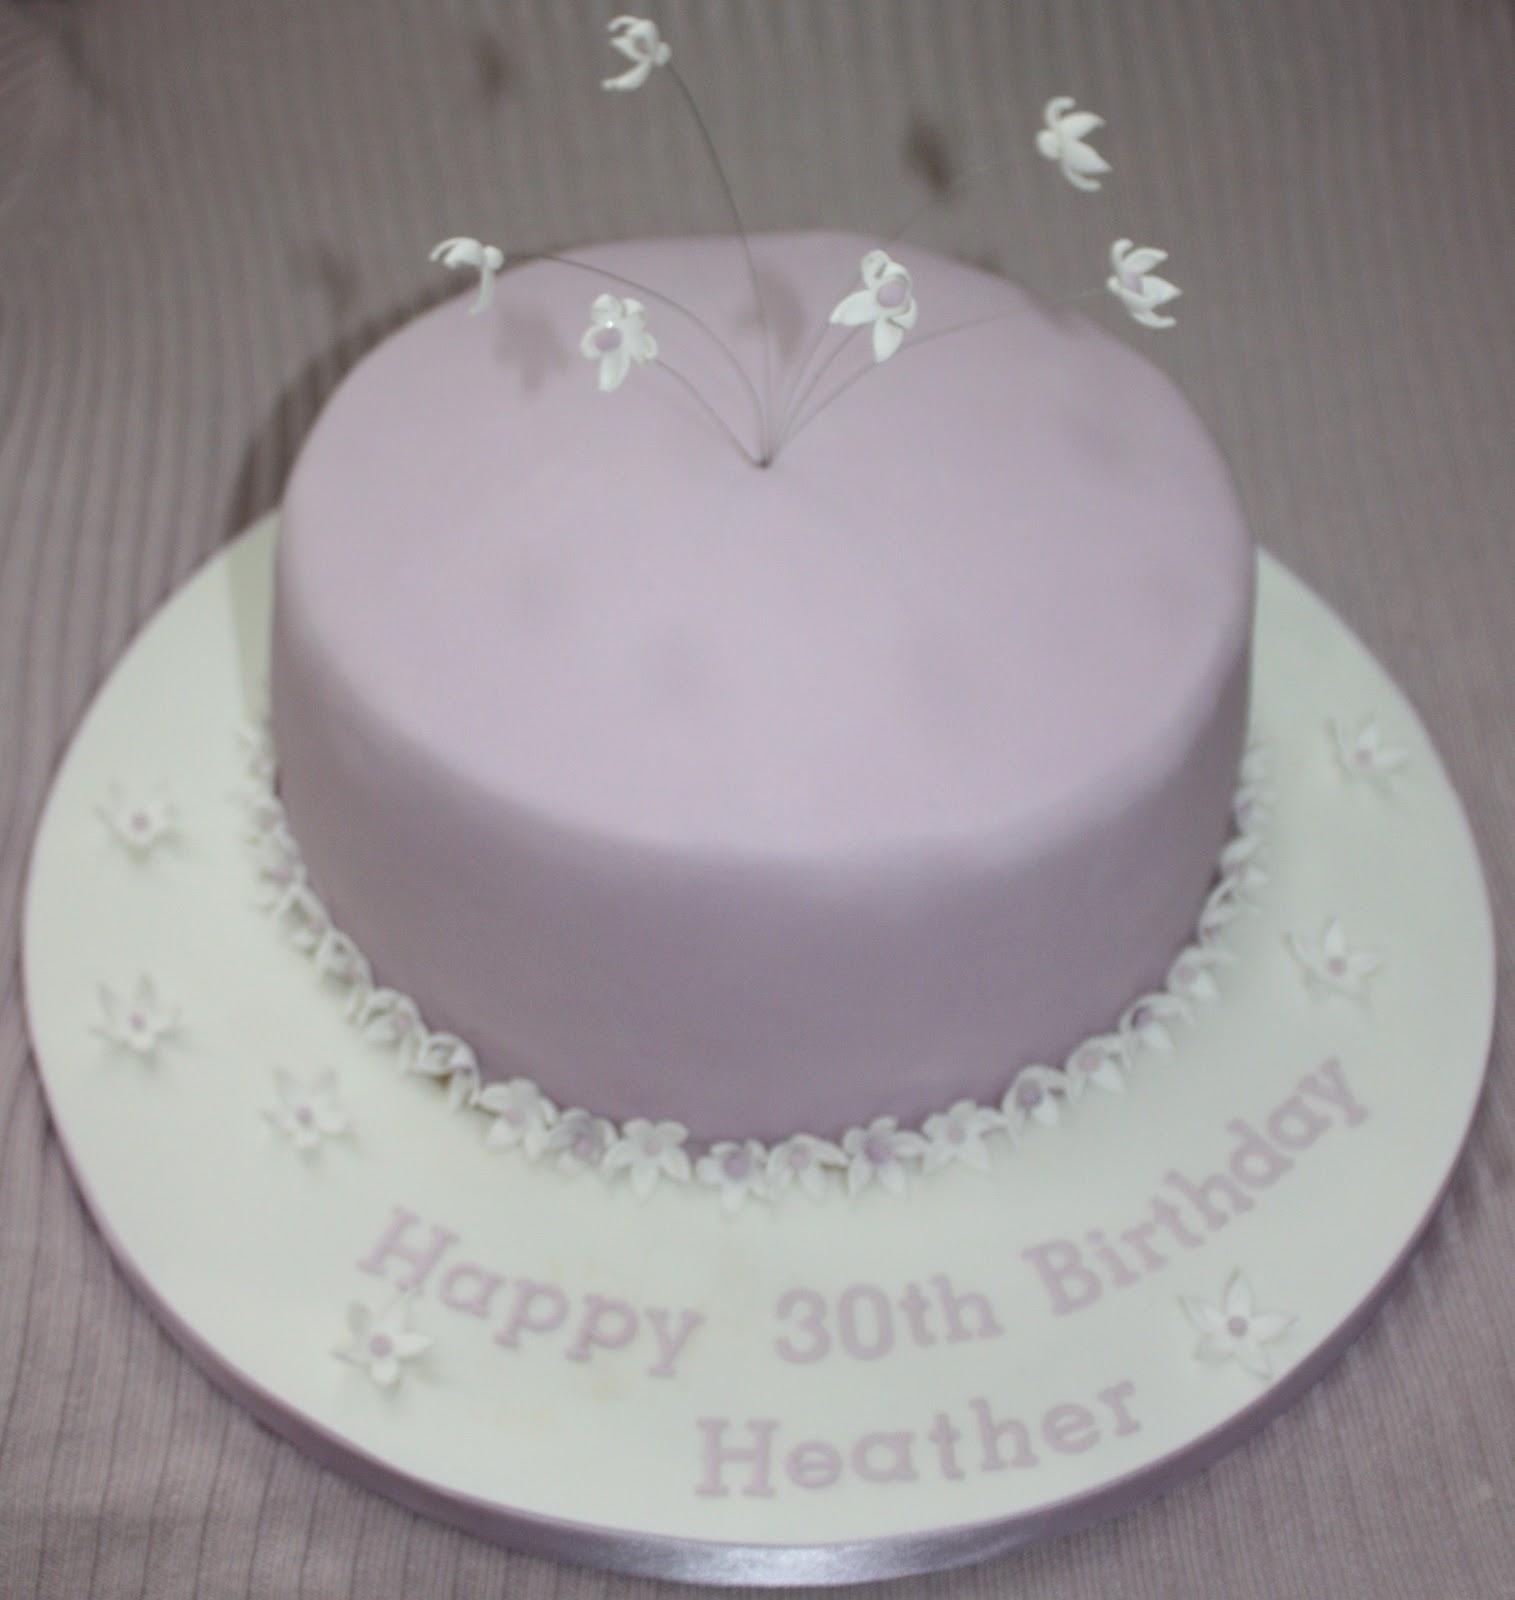 Angies Cakes 30th Birthday Cake Gluten Free Dairy Free Nut